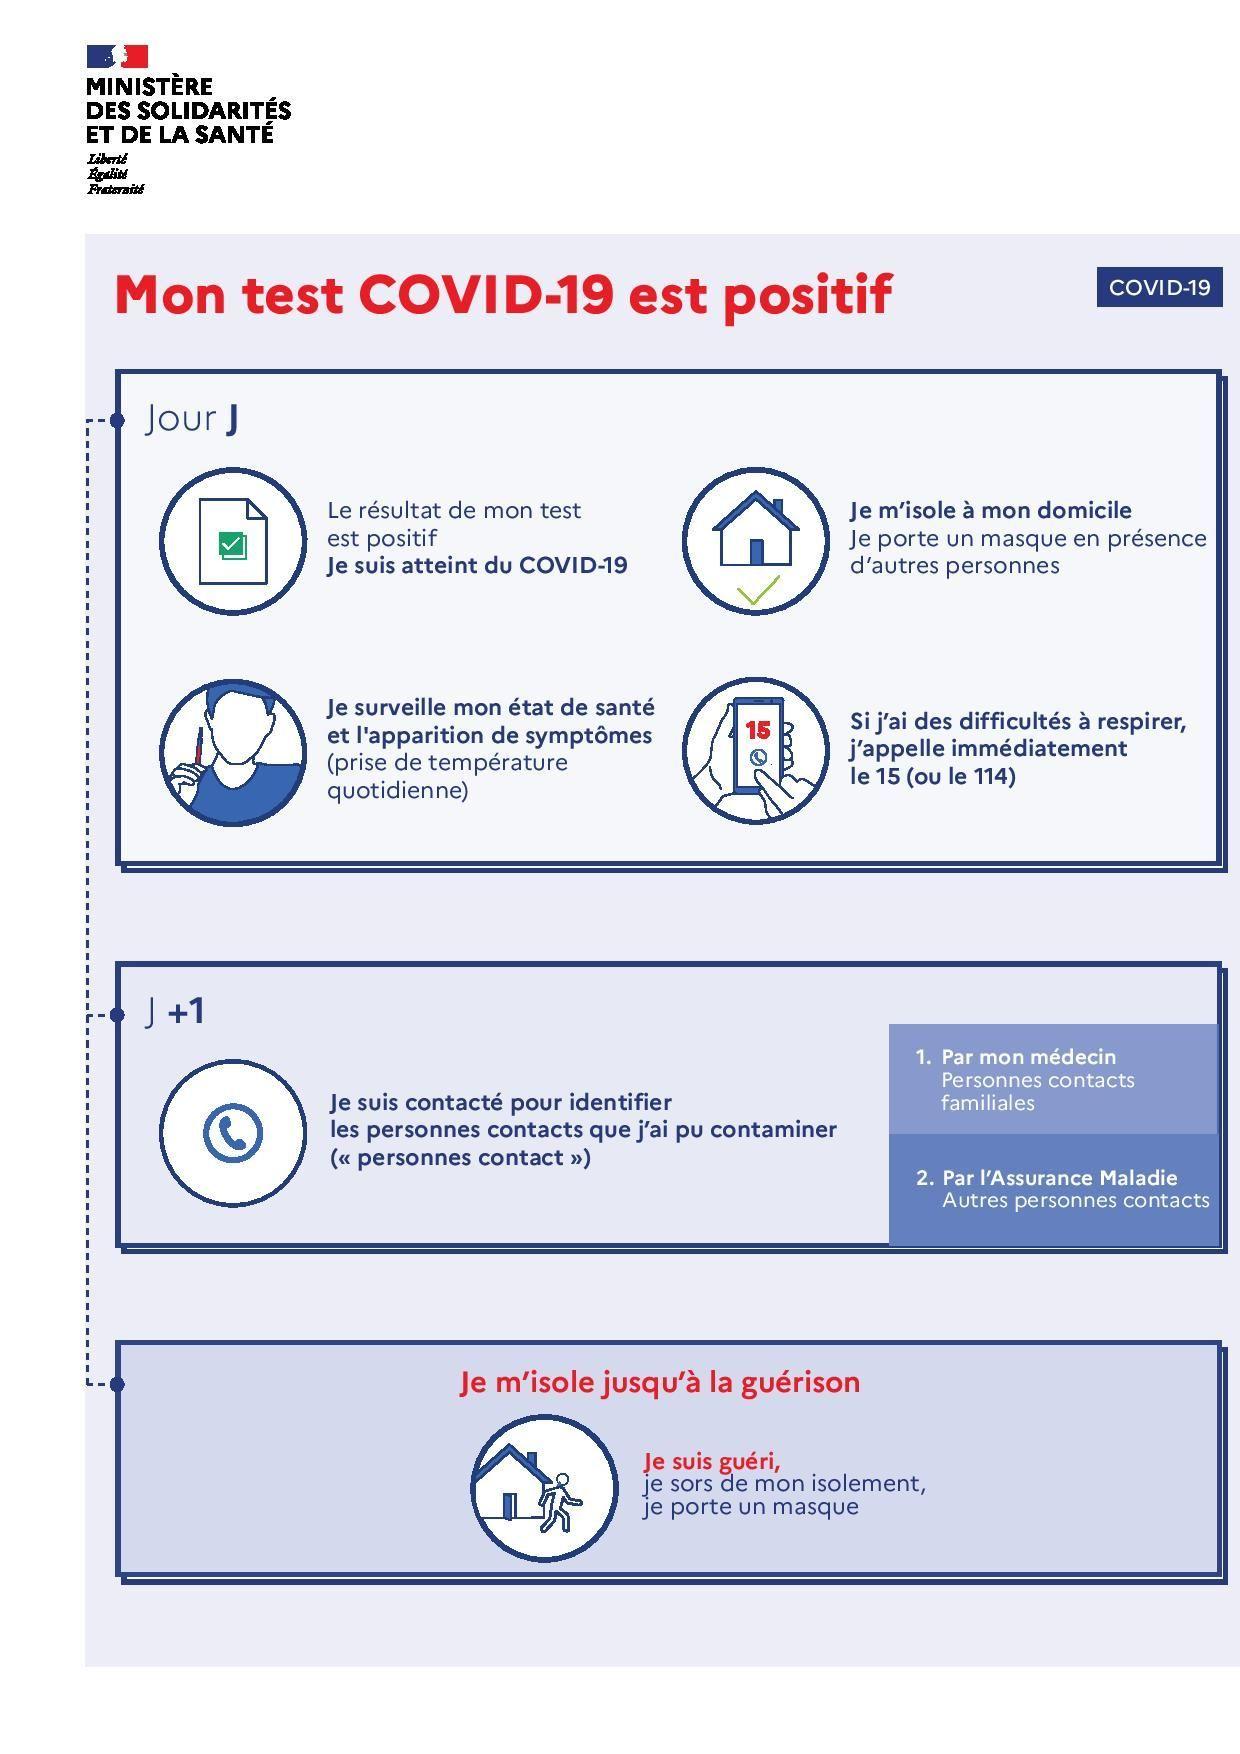 SANTE-COVID19-TEST POSITIF-ok